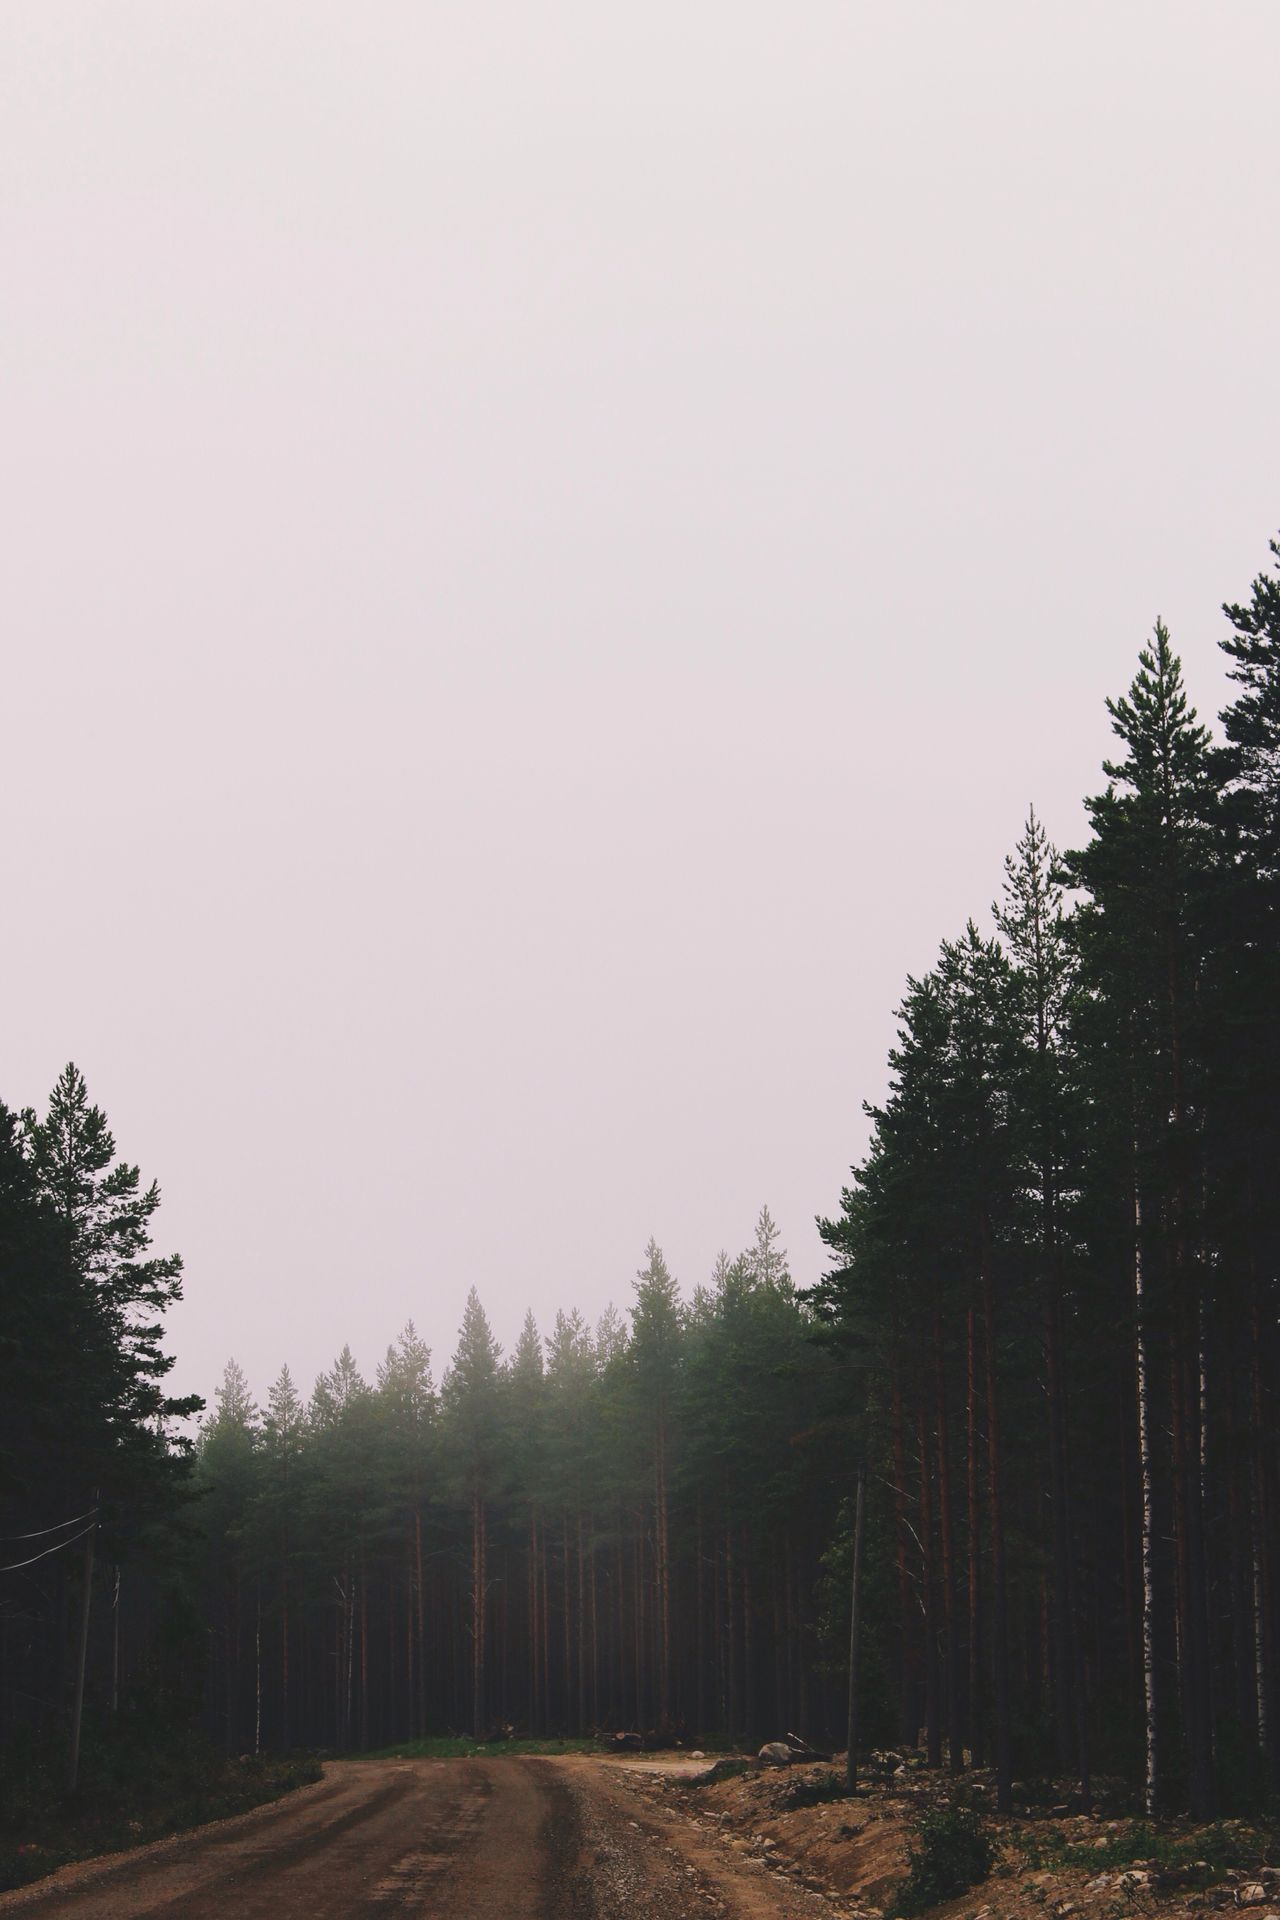 Summer Forest Trees Mist Misty Pine TheWeekOnEyeEM Desolate Hidden Gems  TCPM